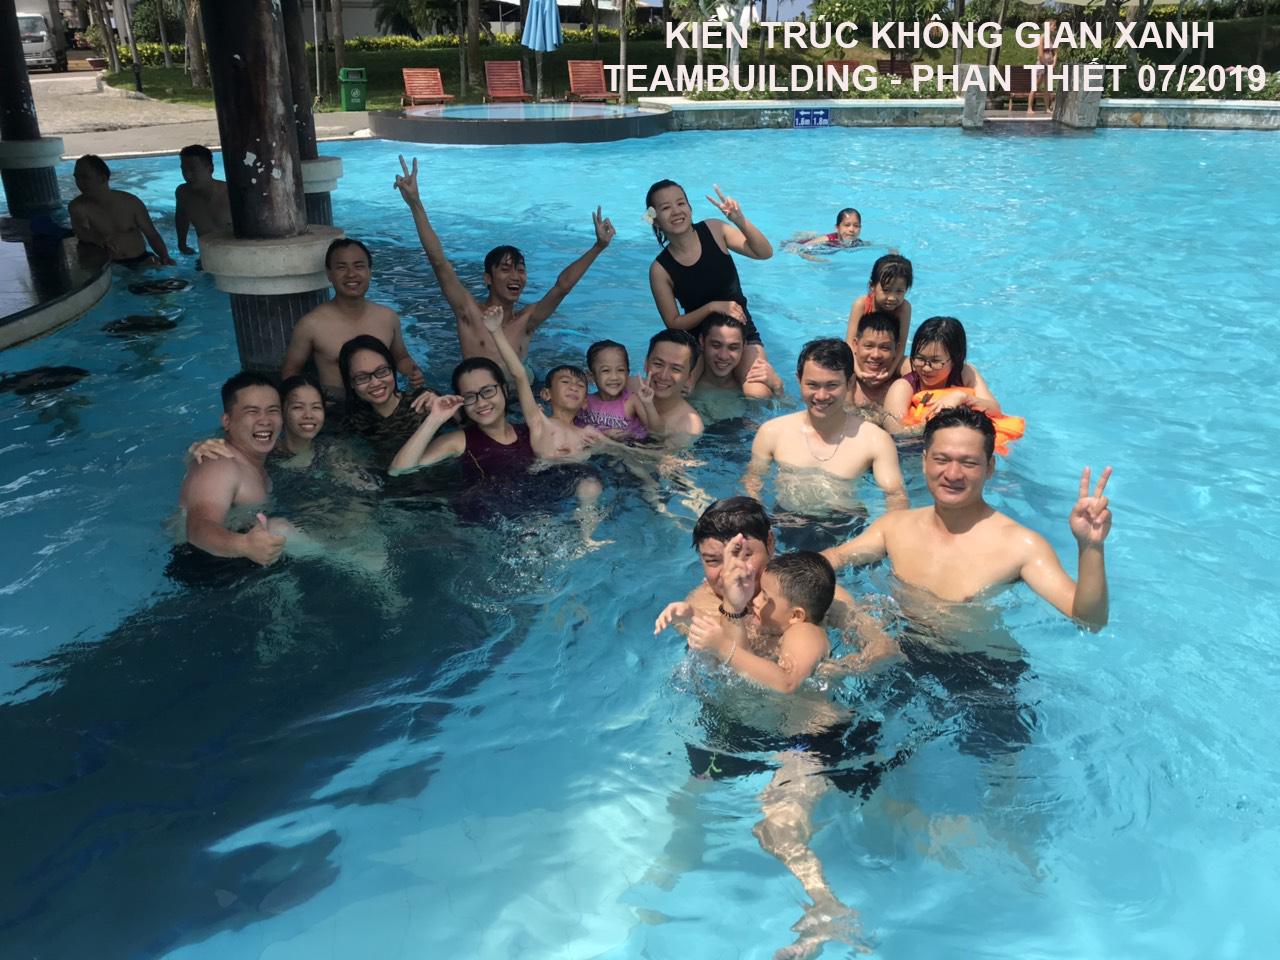 KGX - teambuilding 2019